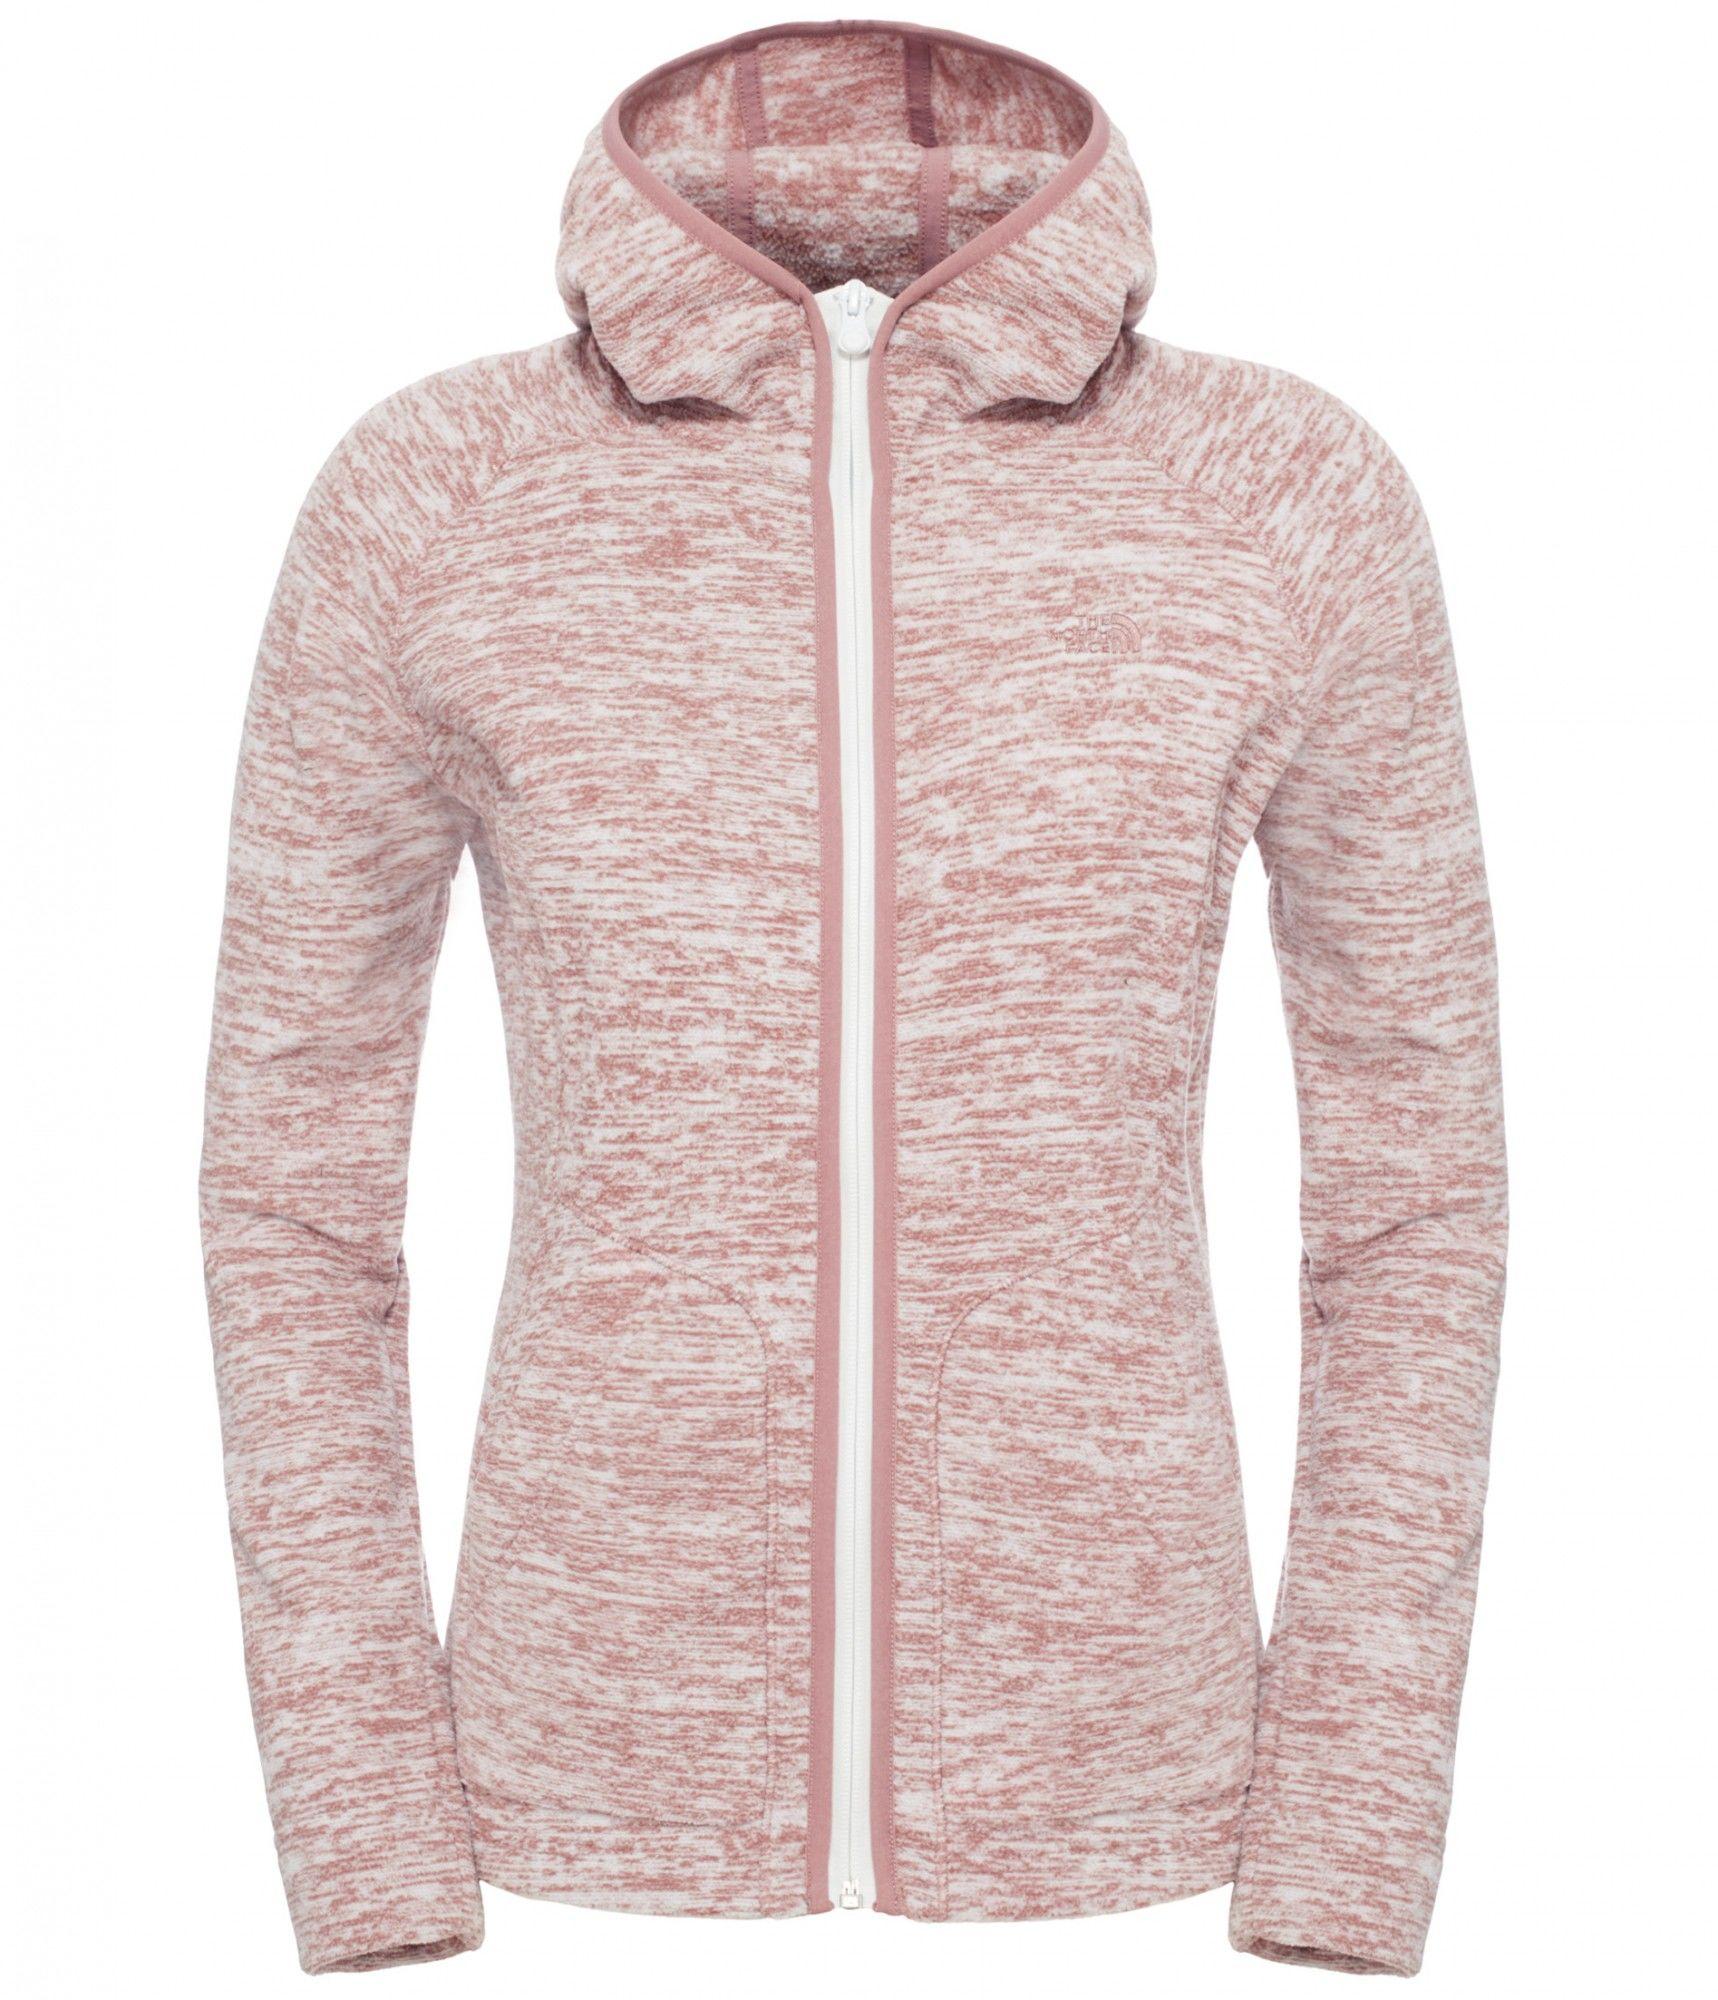 The North Face W Nikster Full Zip Hoodie | Größe XS,S,M,L,XL | Damen Fleecejac